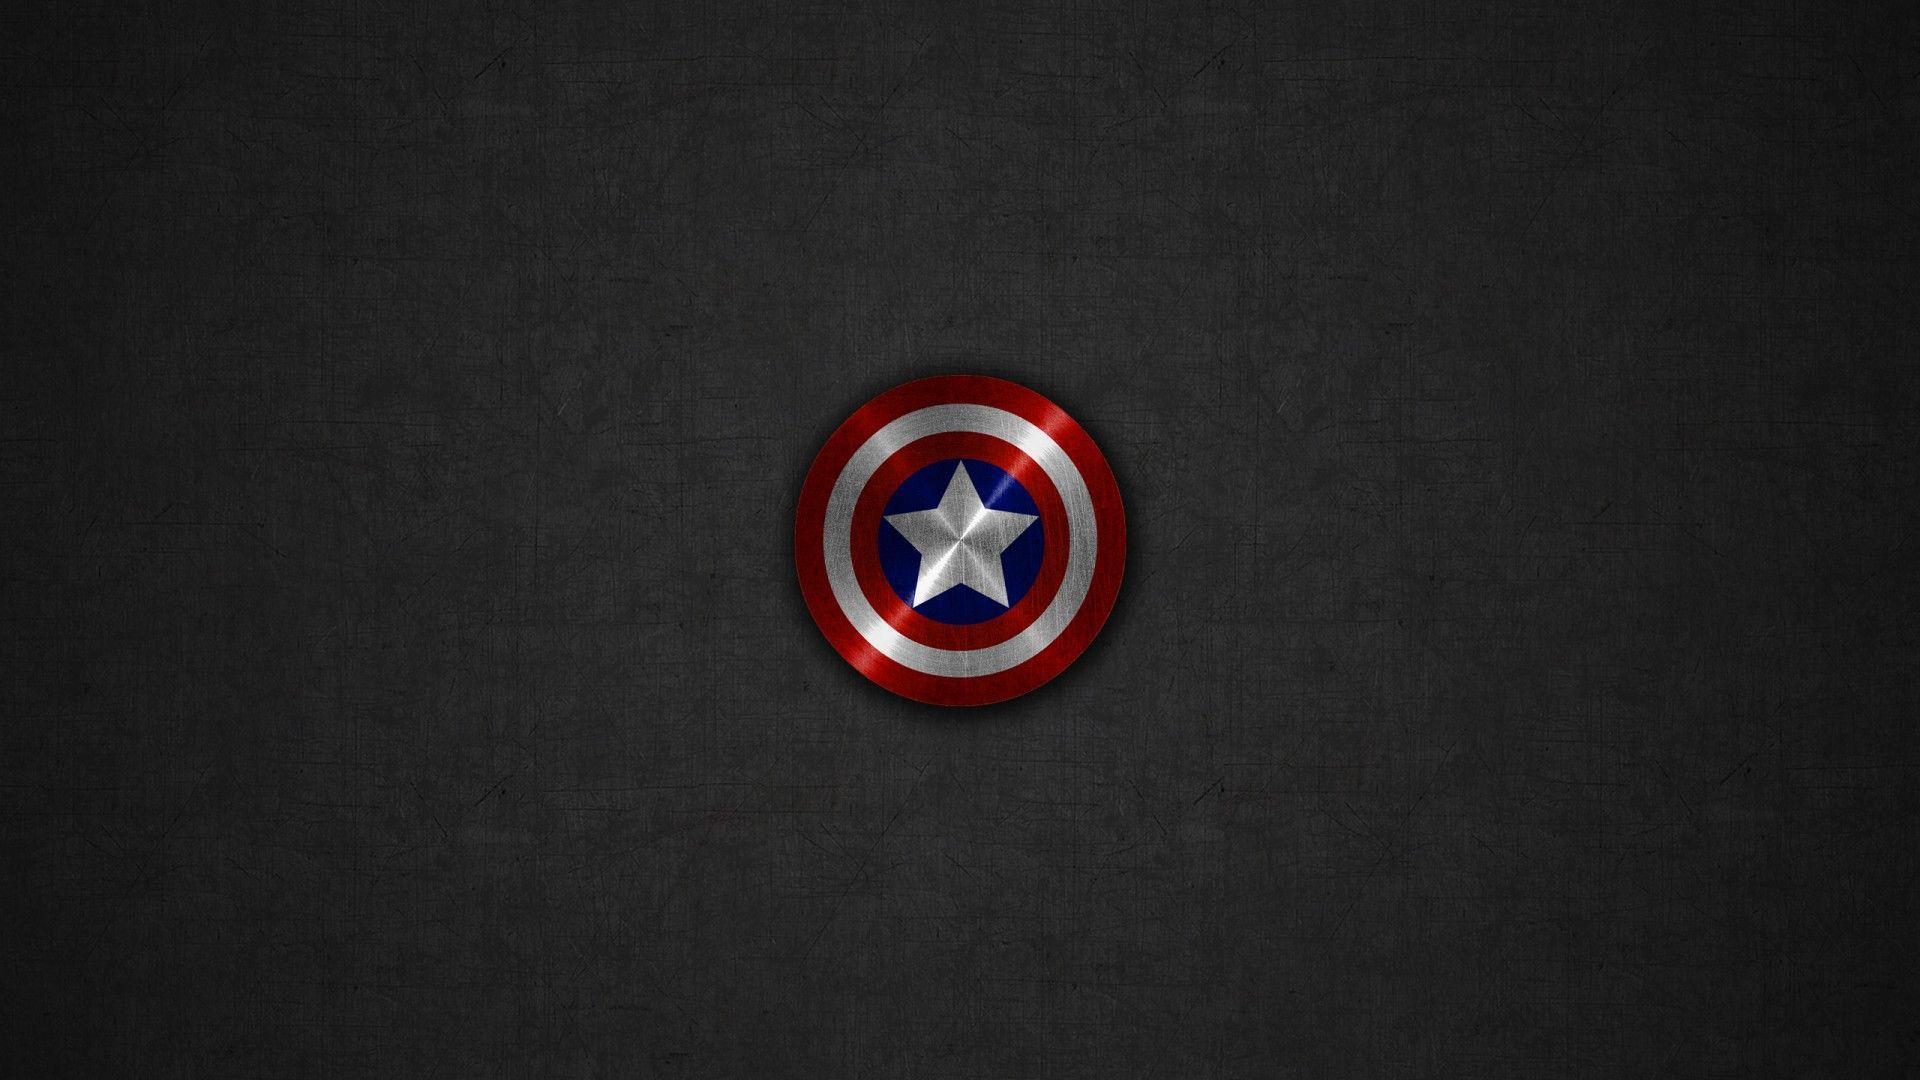 Captain America Shield Gray Linen Background Desktop Wallpaper